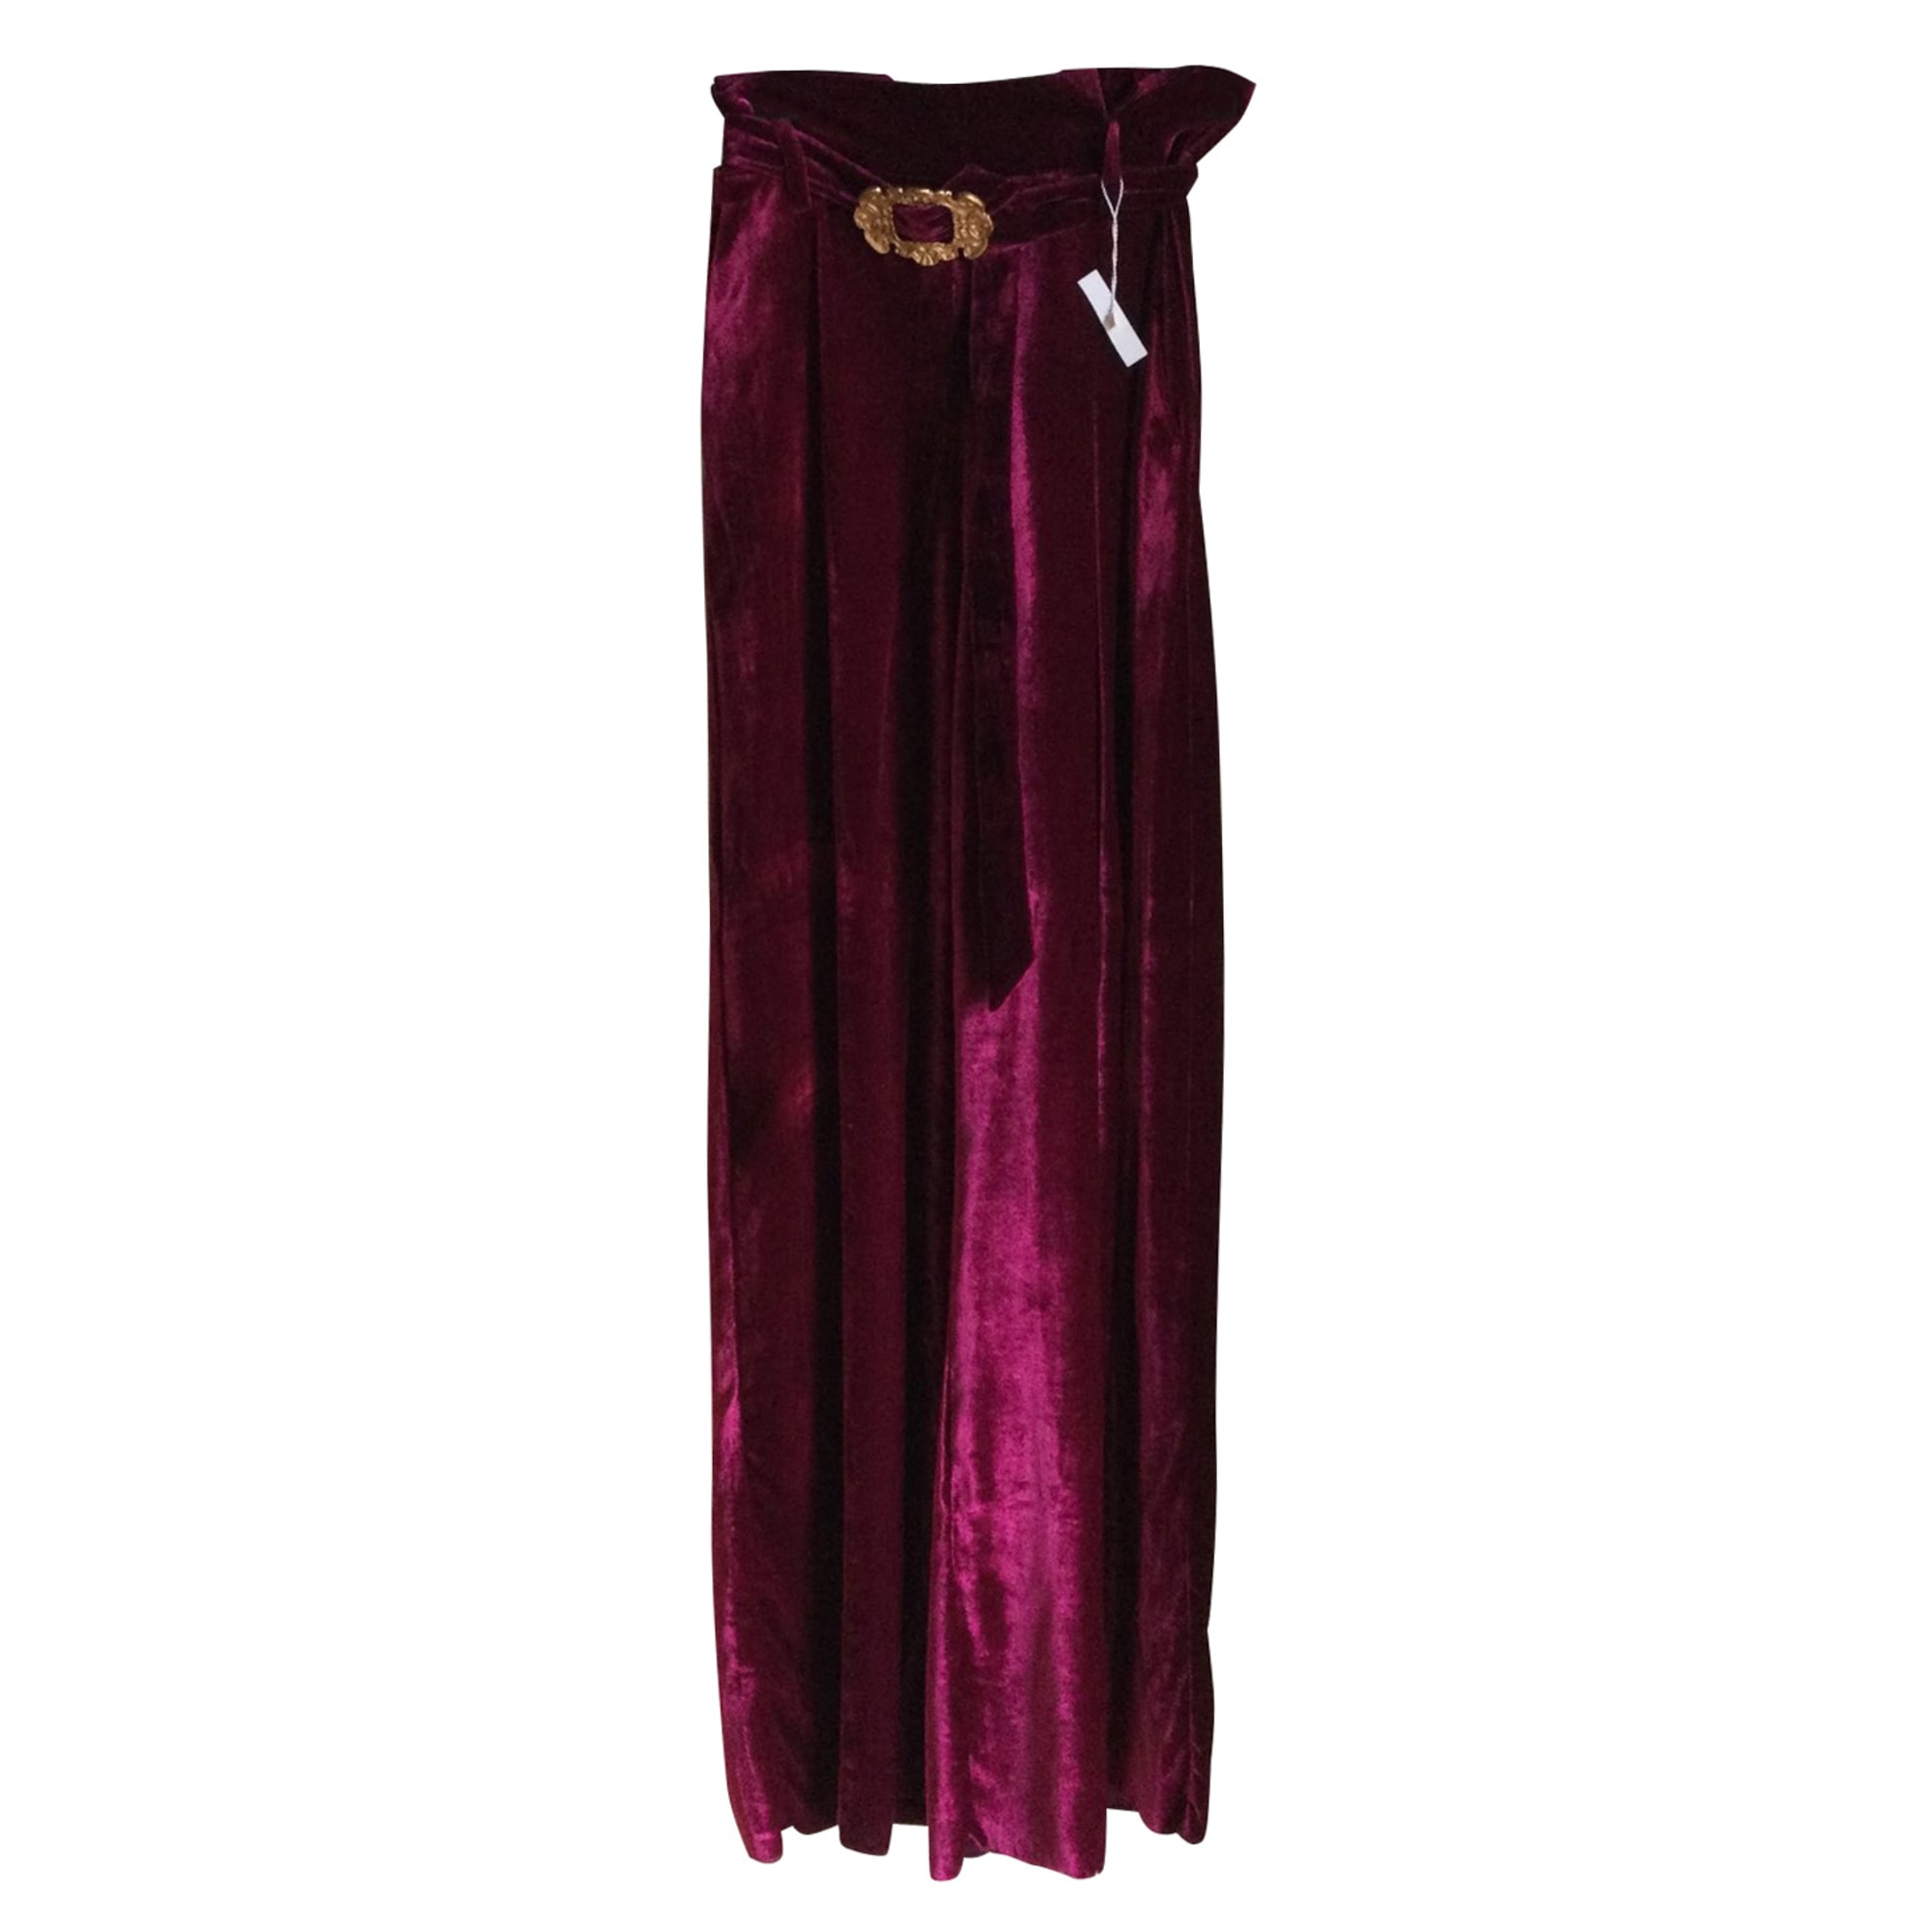 Pantalon large MAX MARA Rouge, bordeaux